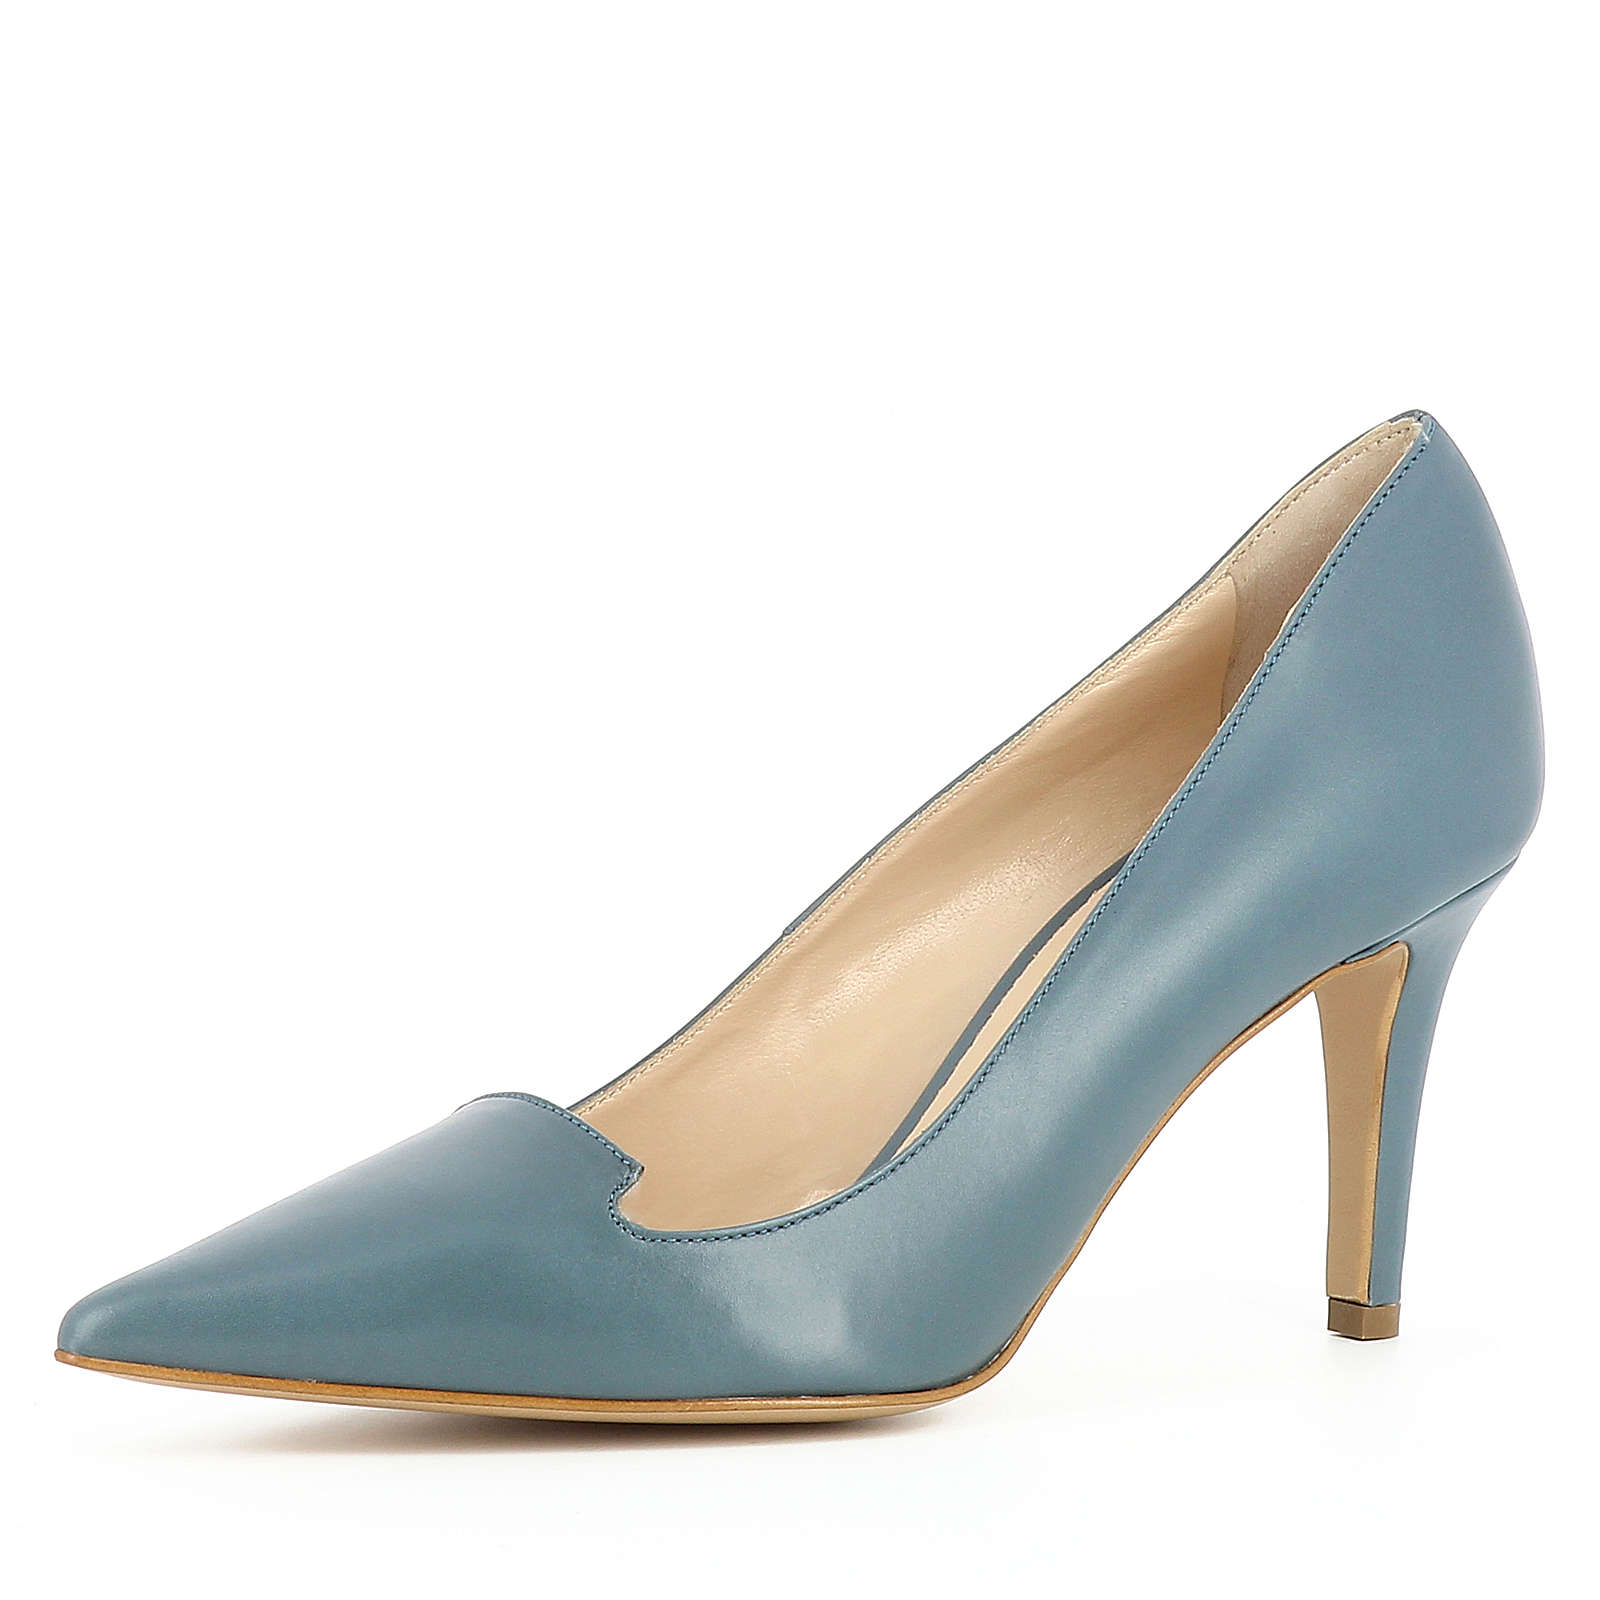 Evita Shoes Klassische Pumps JESSICA blau/grau Damen Gr. 40